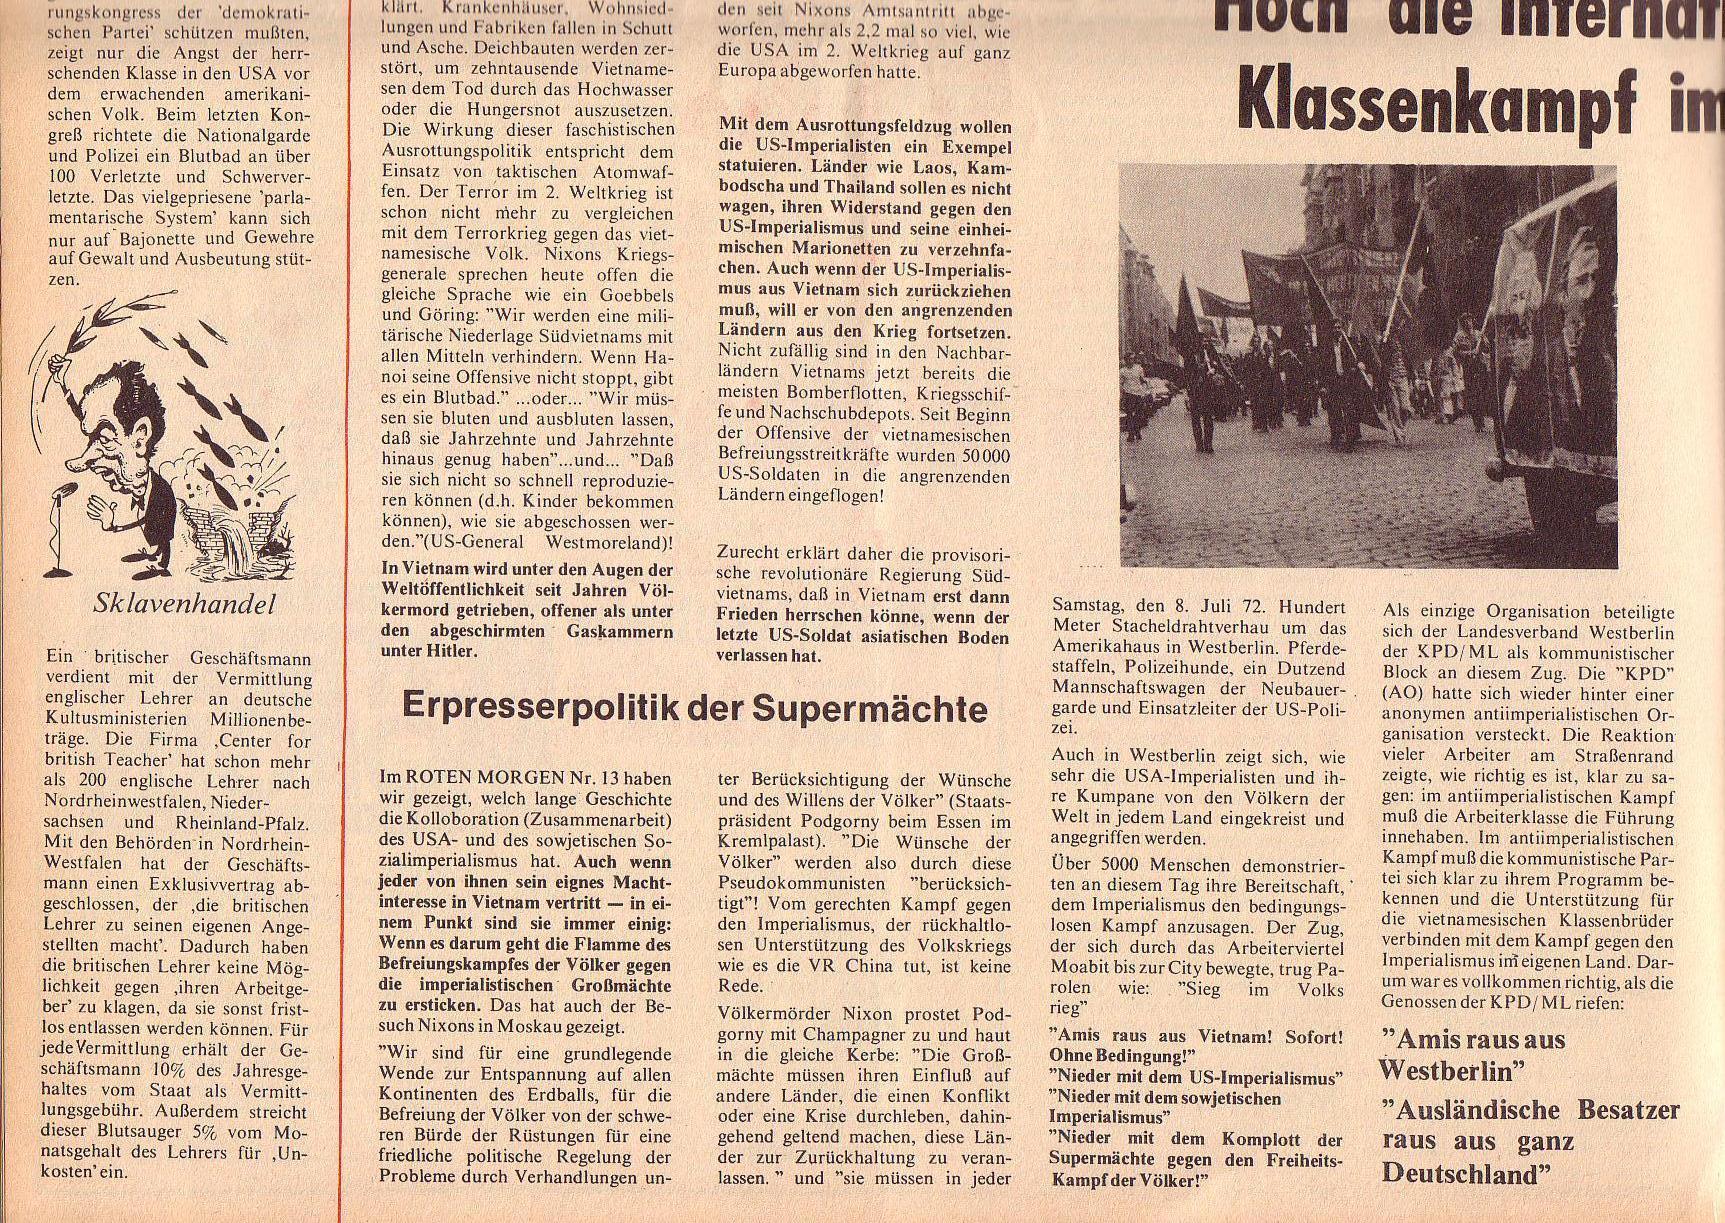 Roter Morgen, 6. Jg., 31. Juli 1972, Nr. 15, Seite 6b